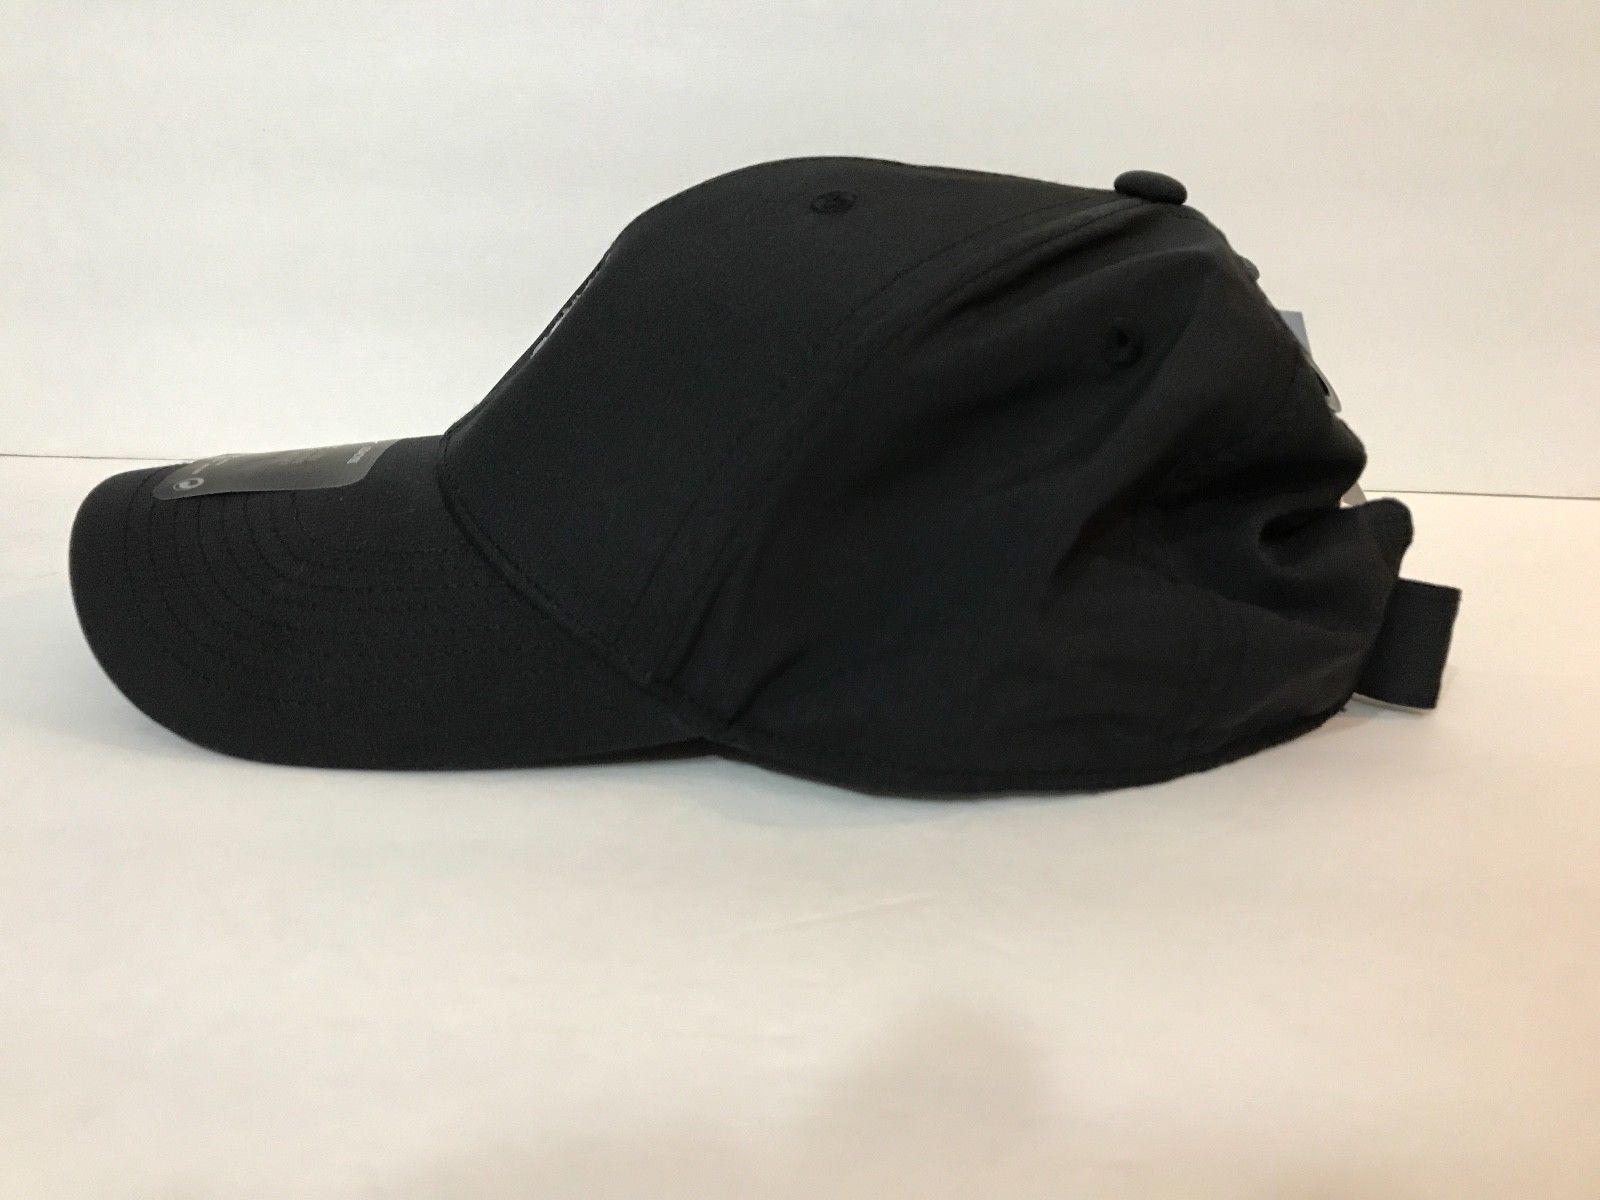 00a2851a4fdc7 ... aliexpress disney parks icon mickey mouse nike black baseball cap hat  unisex new d9d0d 8d3a9